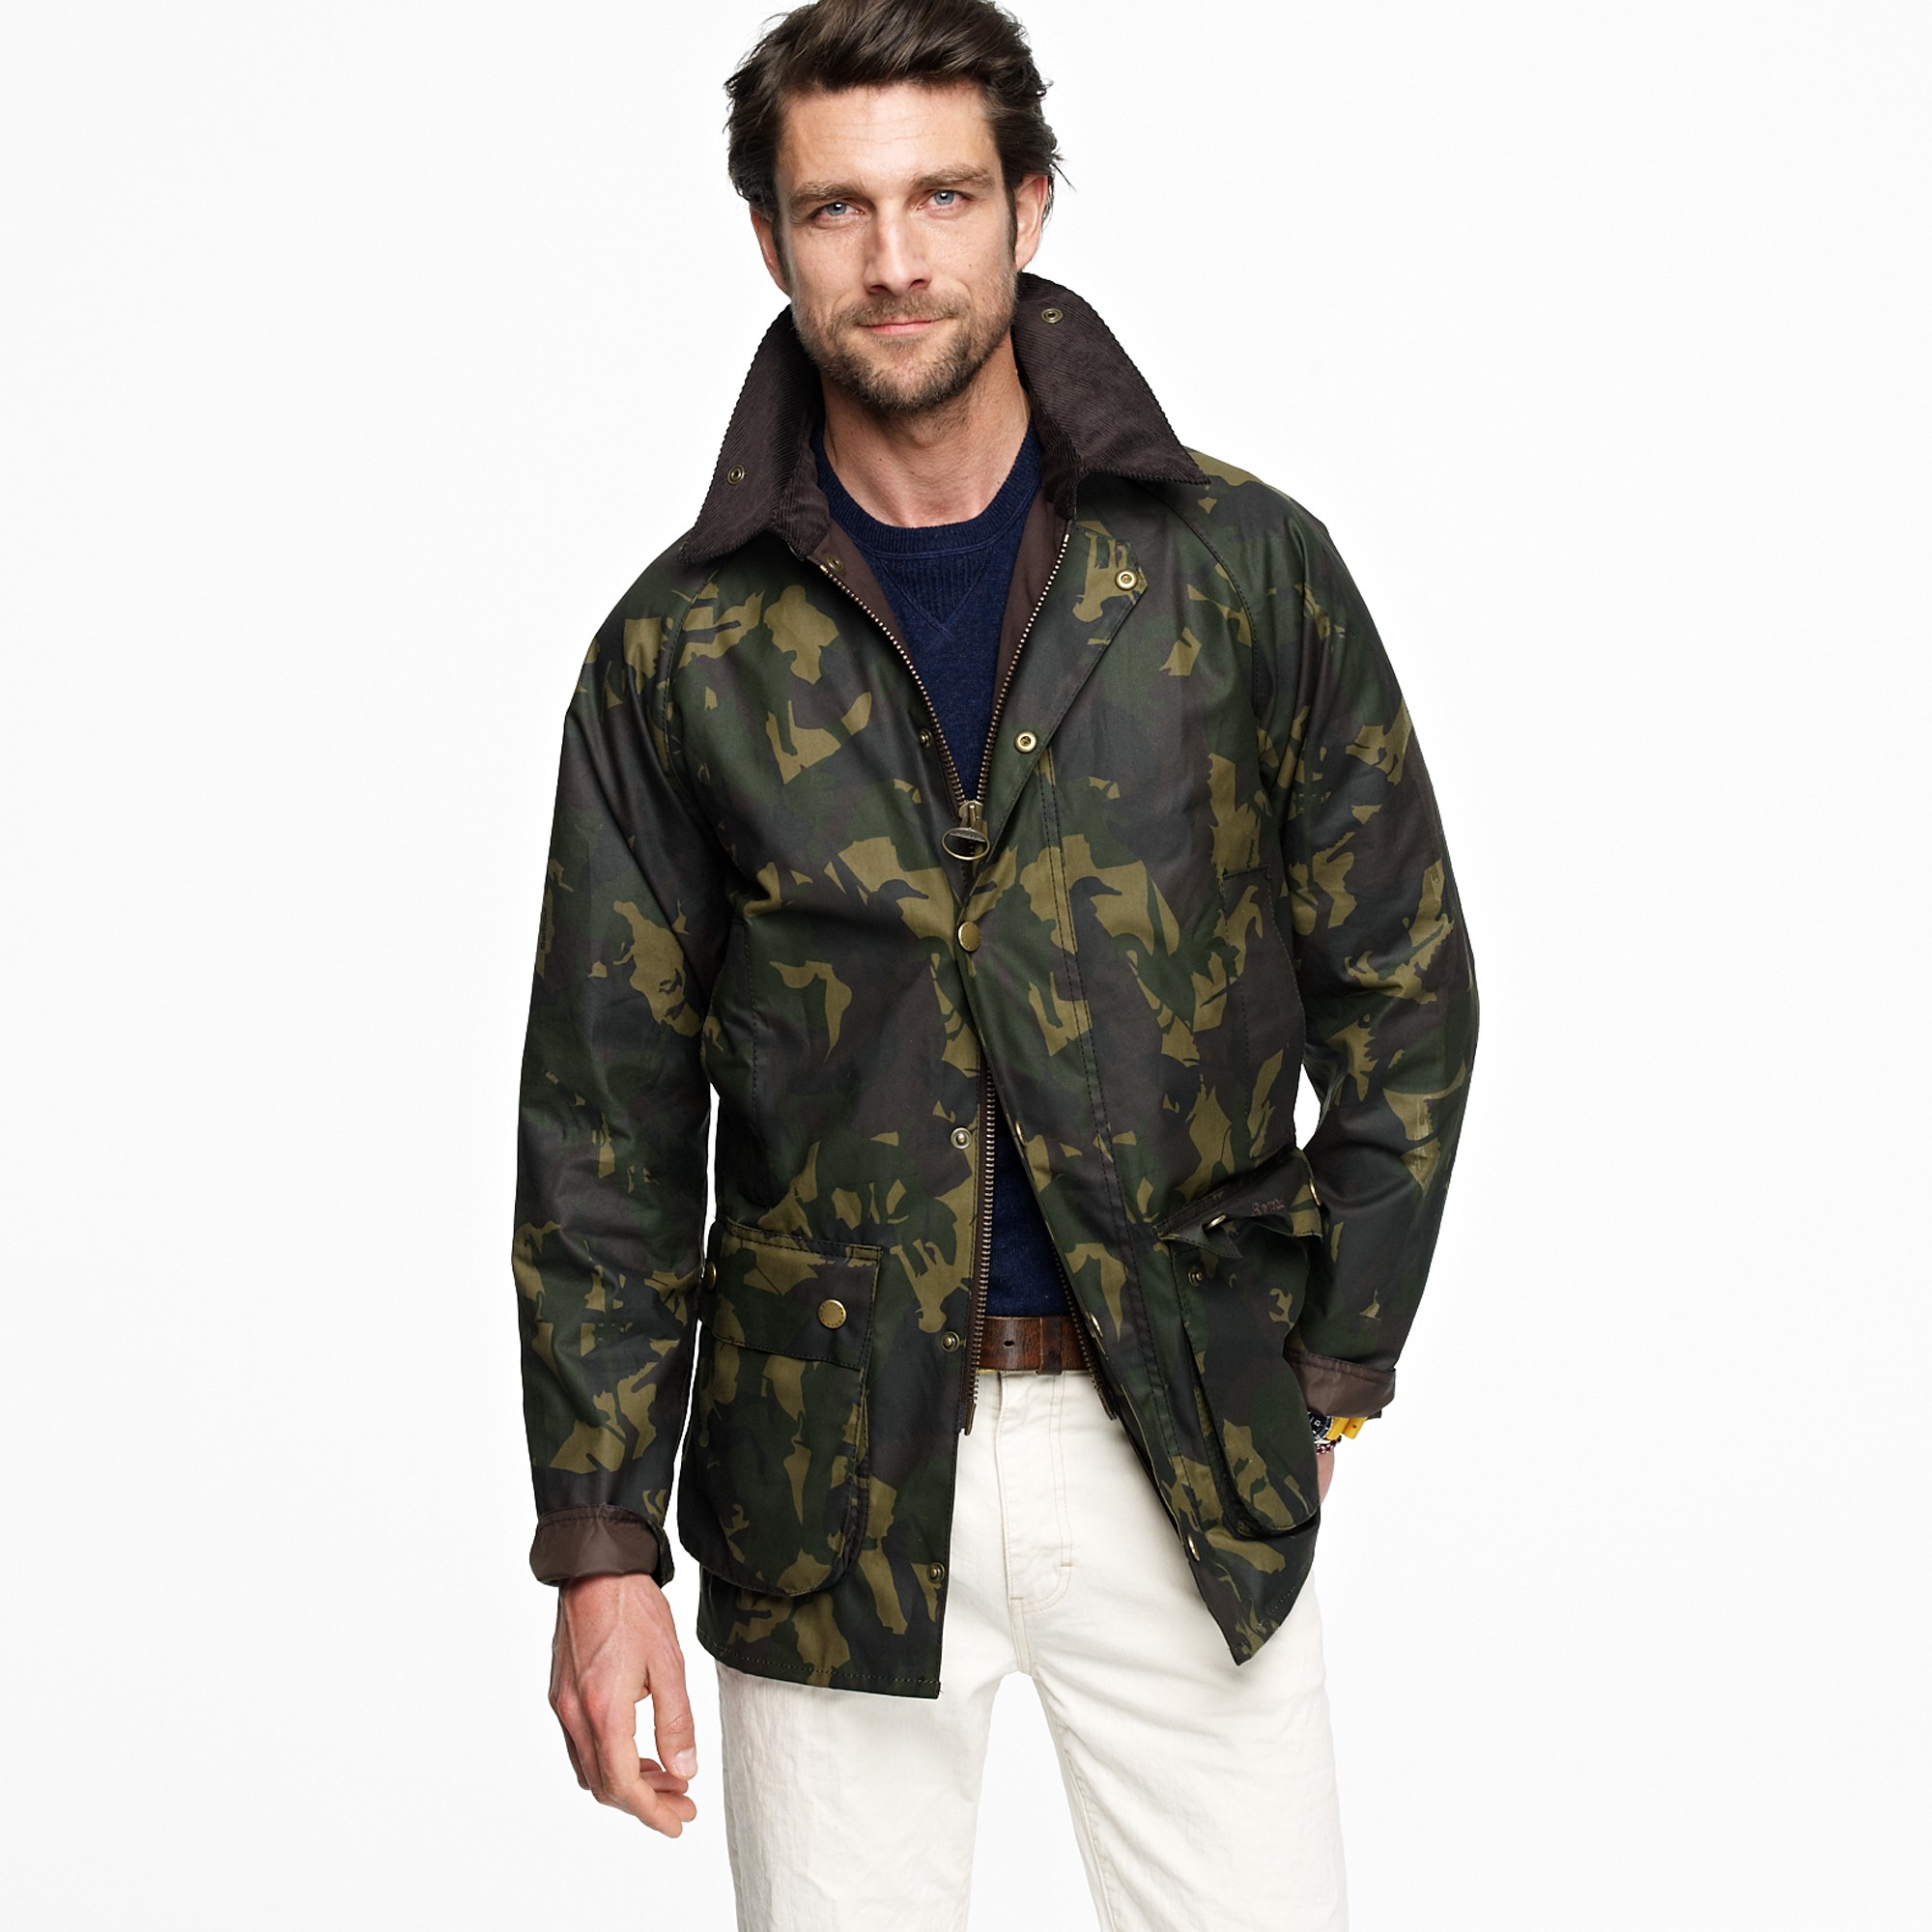 J Crew Barbour Bourne Camo Jacket In Olive Green For Men